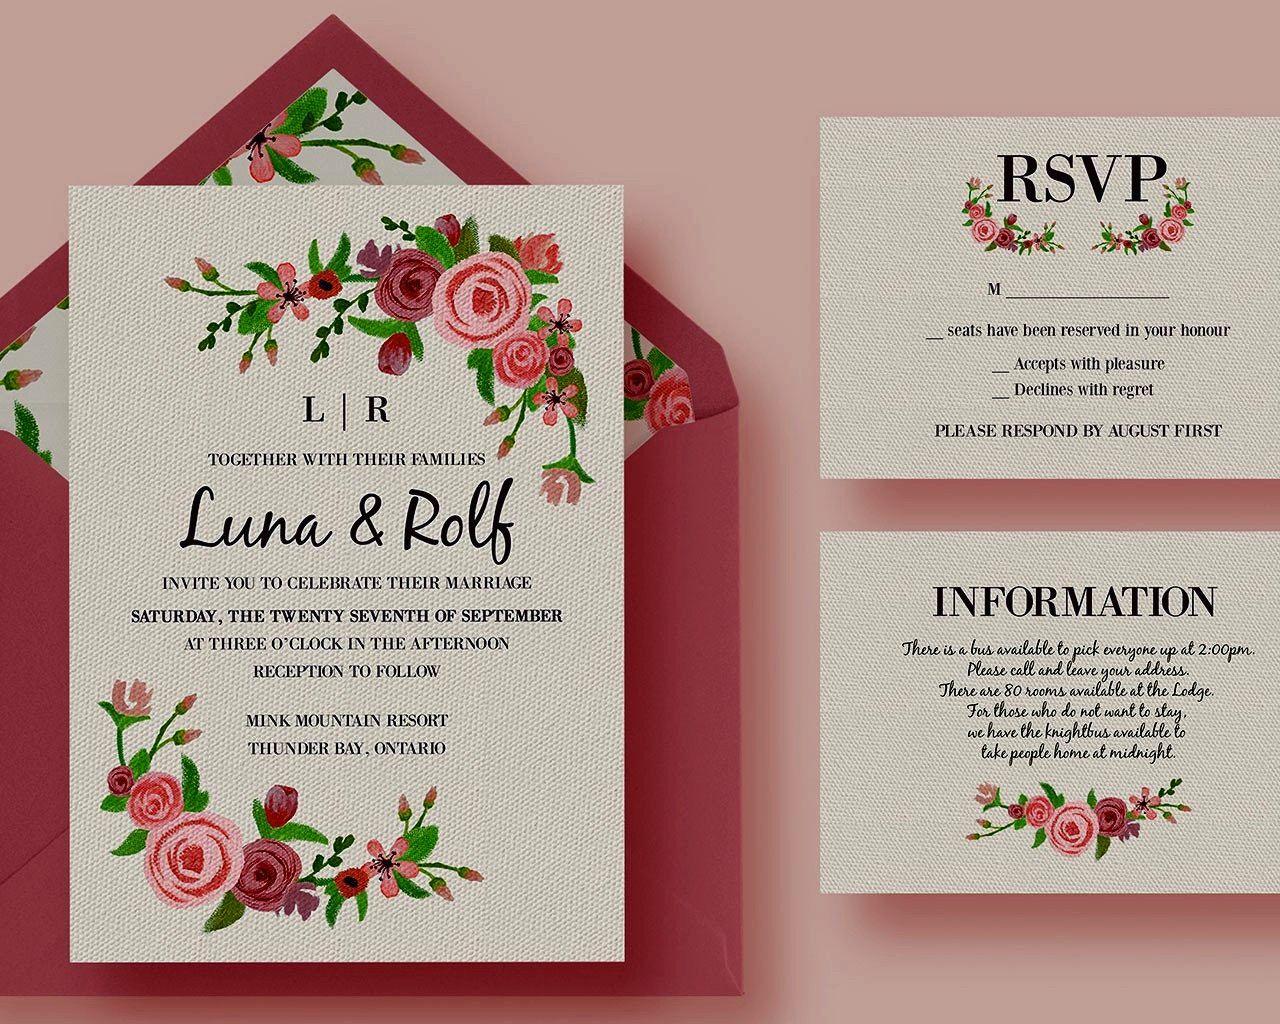 Creative Wedding Invitation Card Design Ideas In 2020 Create Wedding Invitations Creative Wedding Invitations Wedding Invitation Online Design